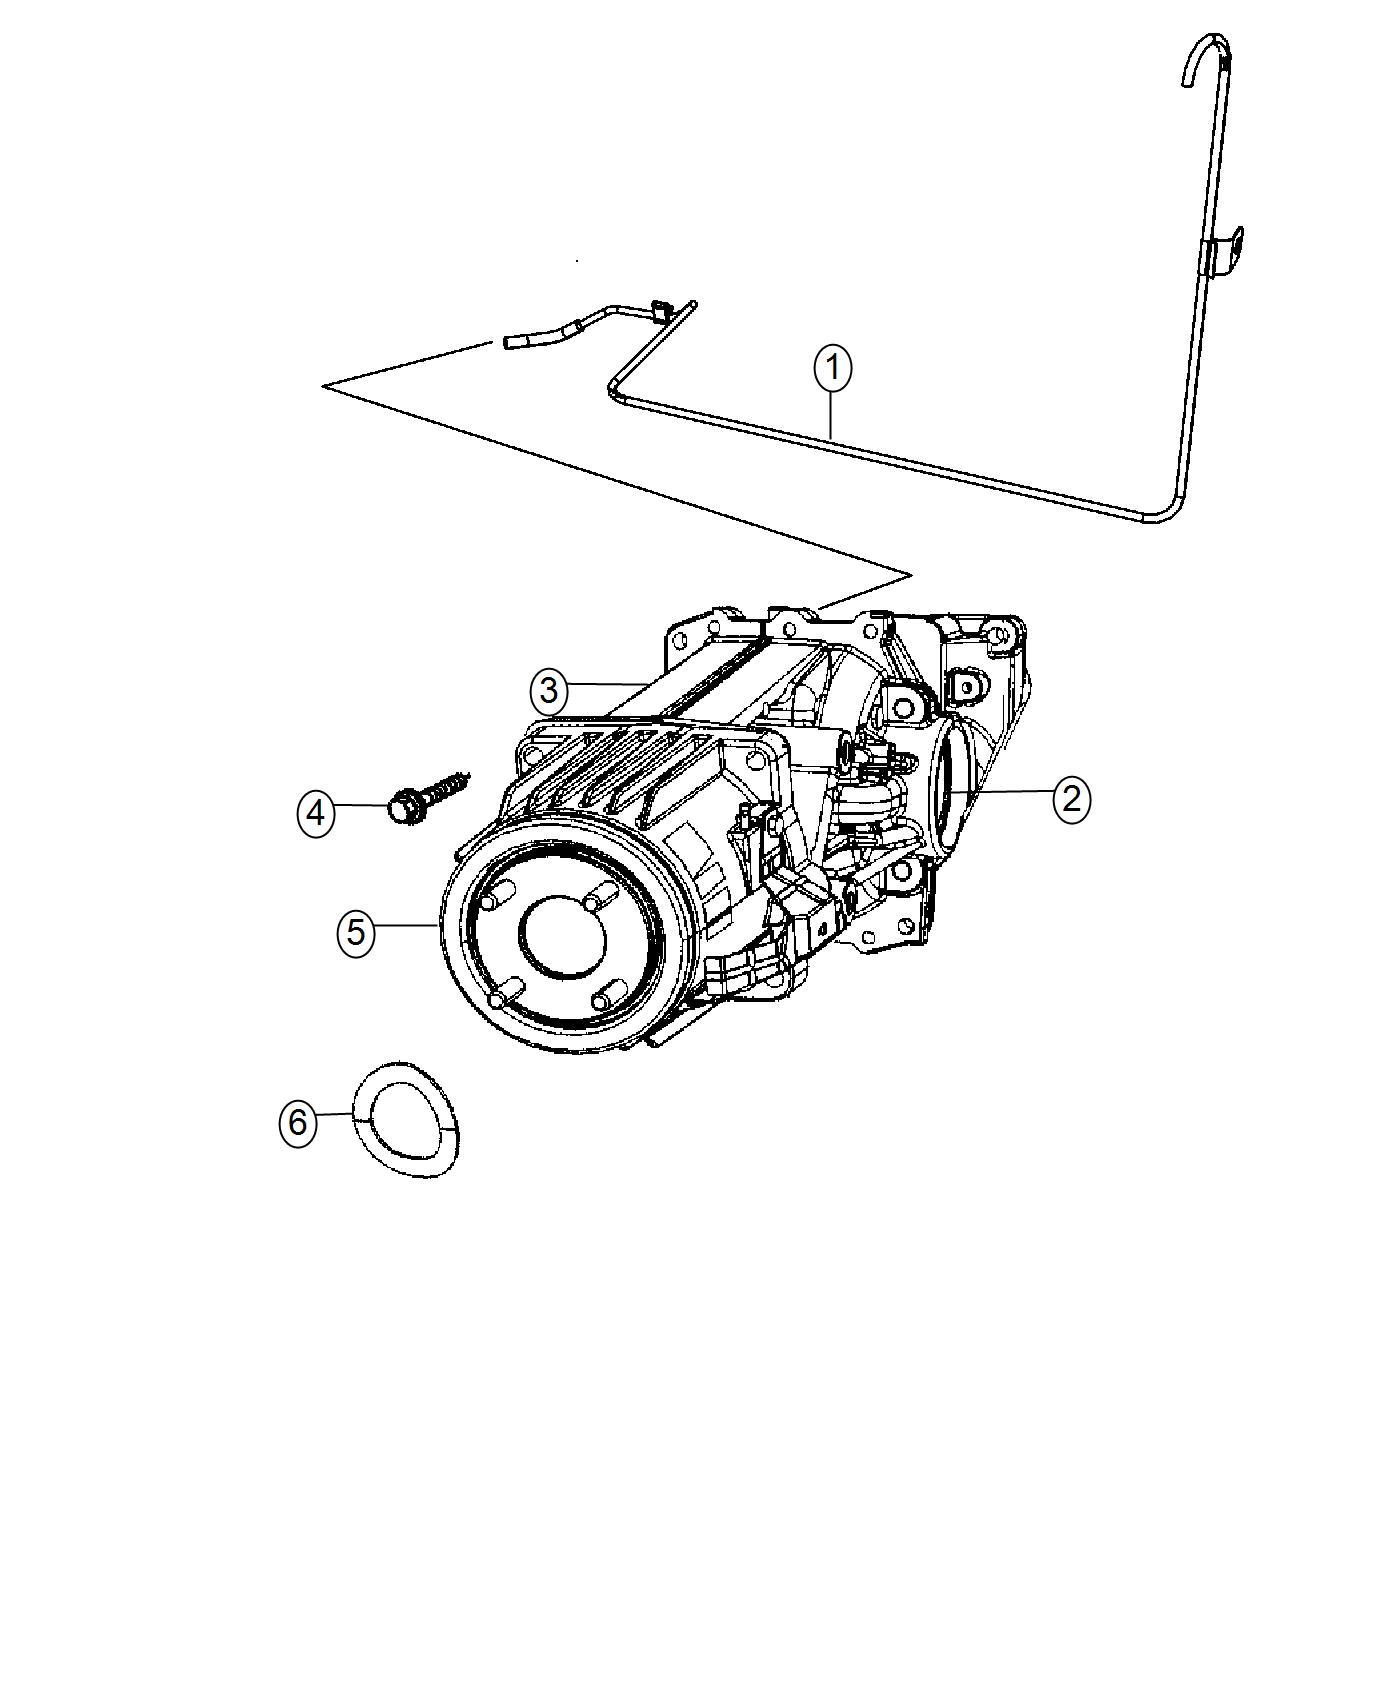 2017 Jeep Patriot Coupling. Electric clutch. Dav, rear